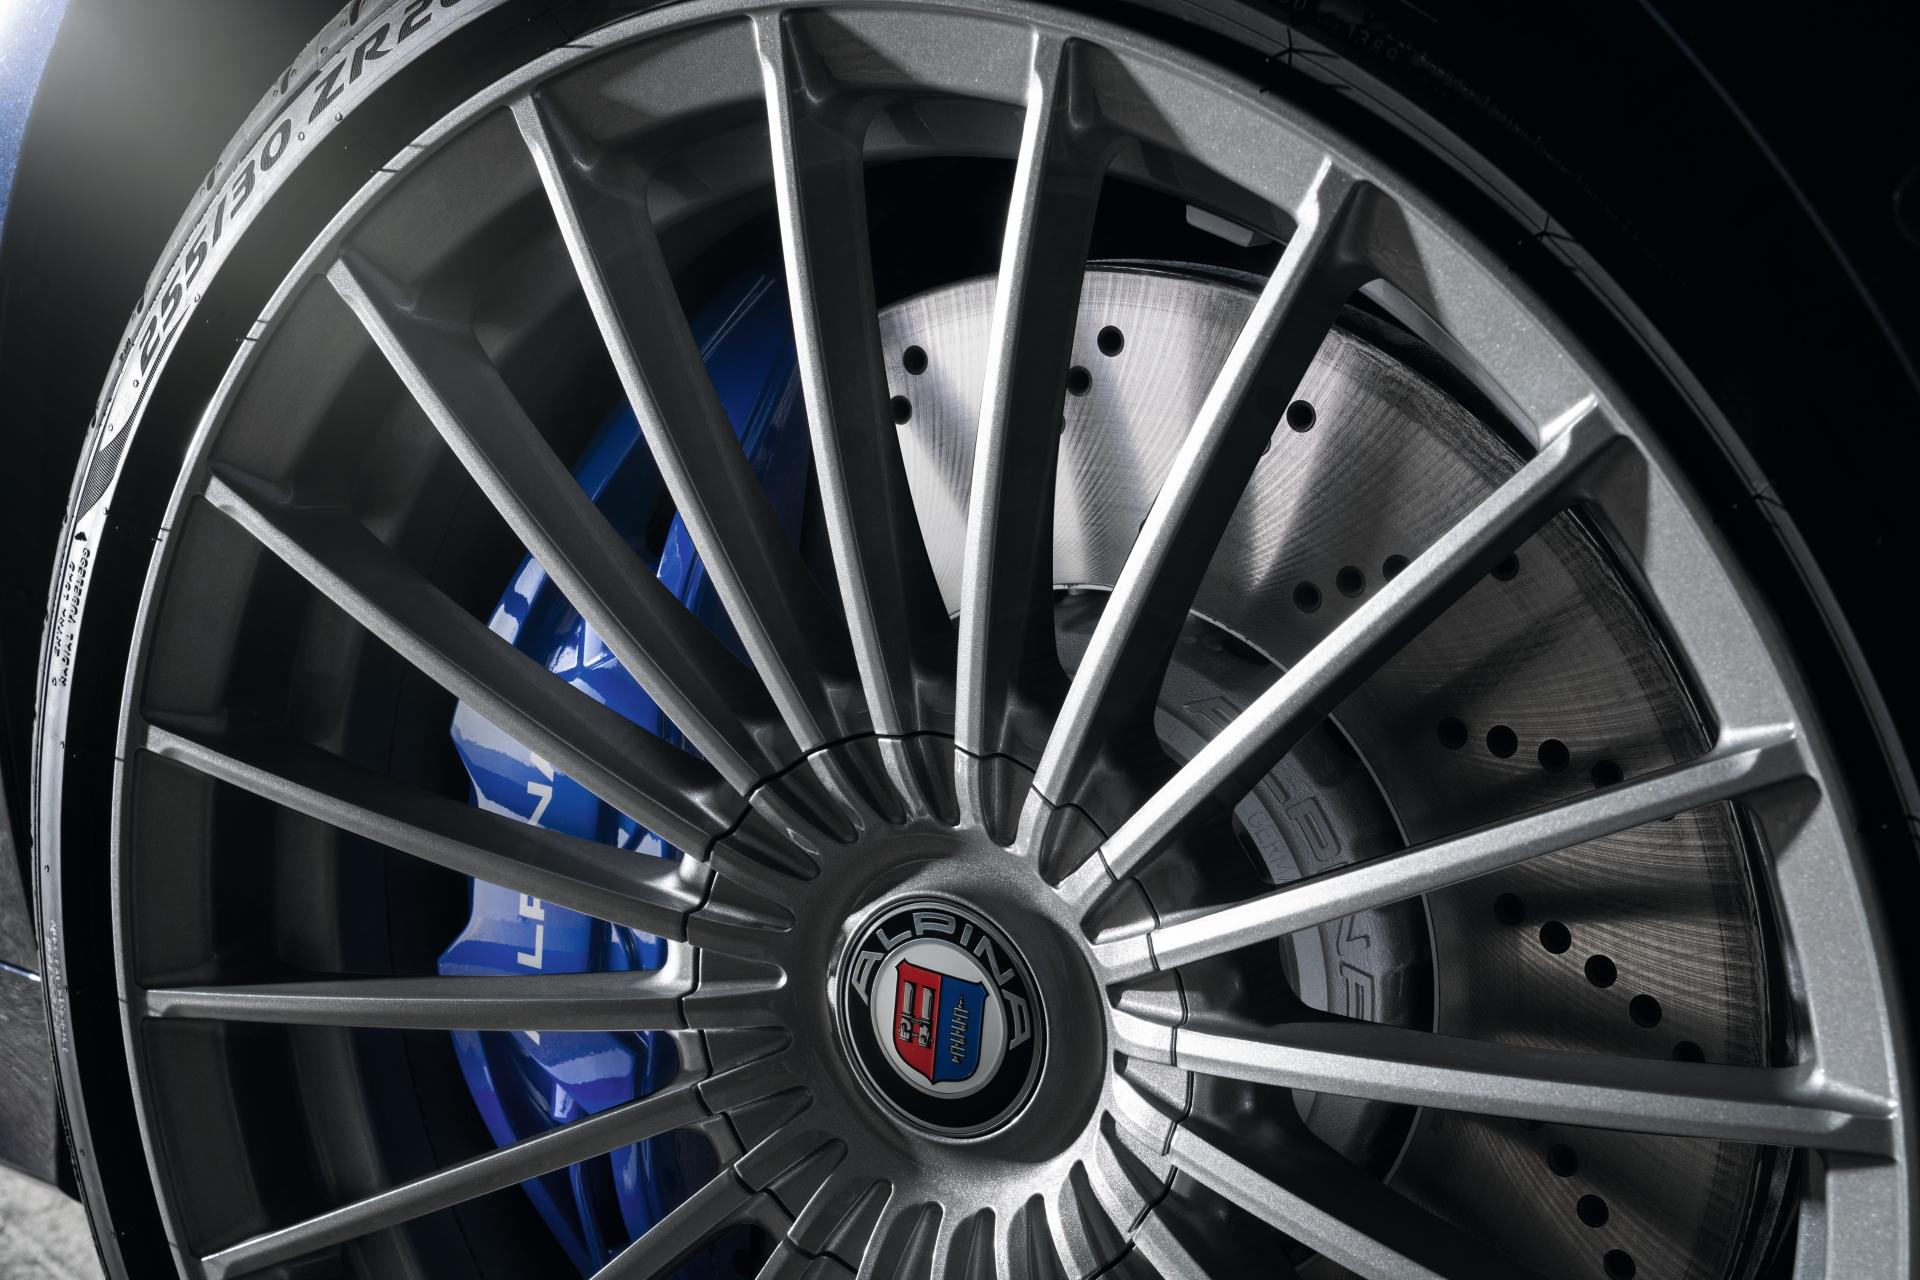 The Principle Of 20 Spokes History Of The Alpina Wheel Design